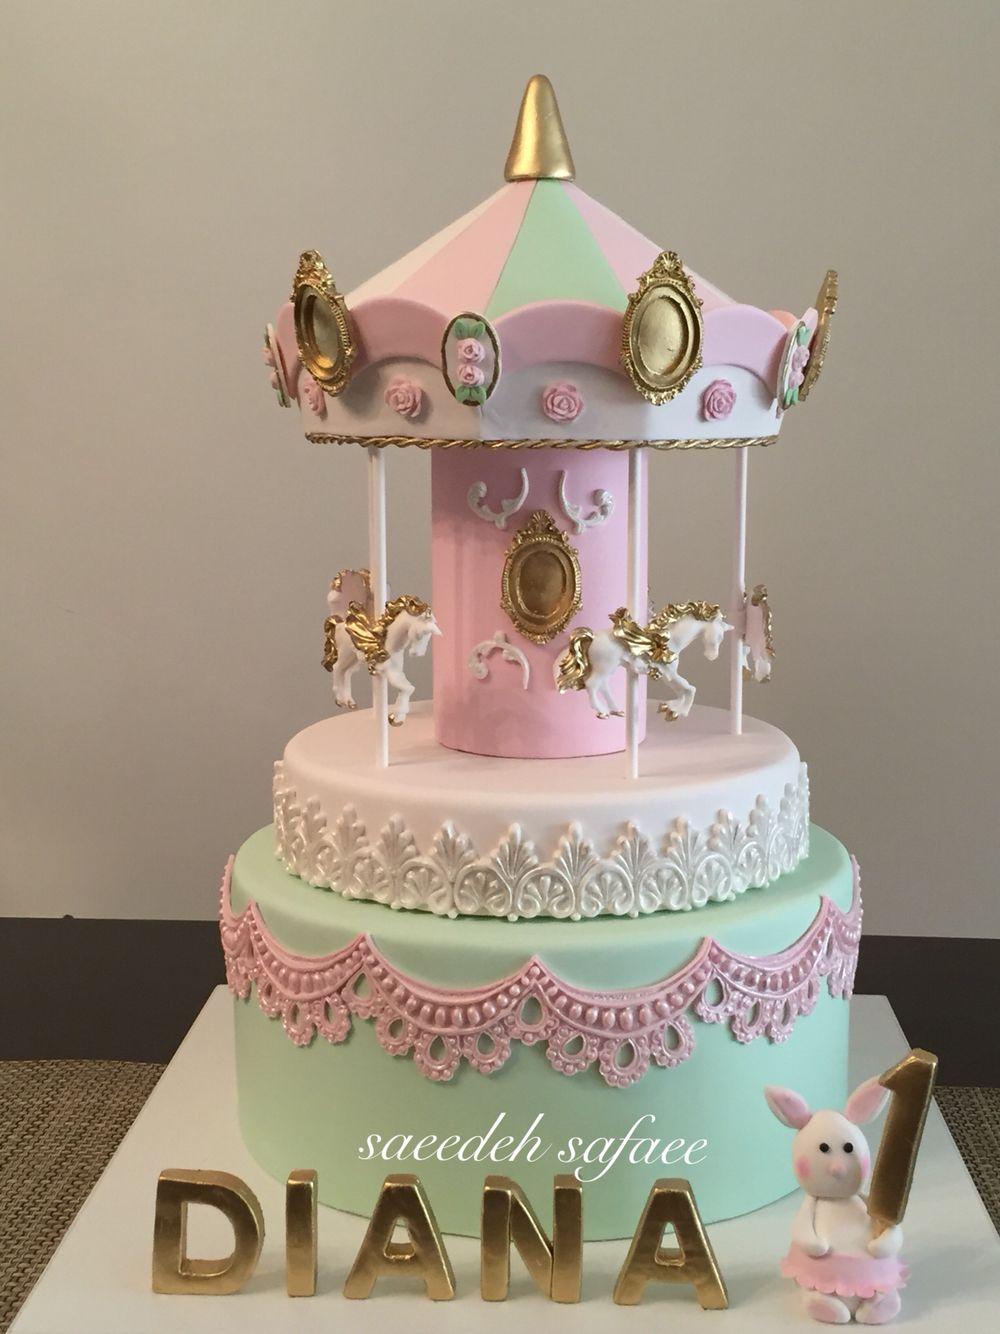 Cake Design Carousel : carousel cake fondant cake Pinterest Carousel cake and Cake